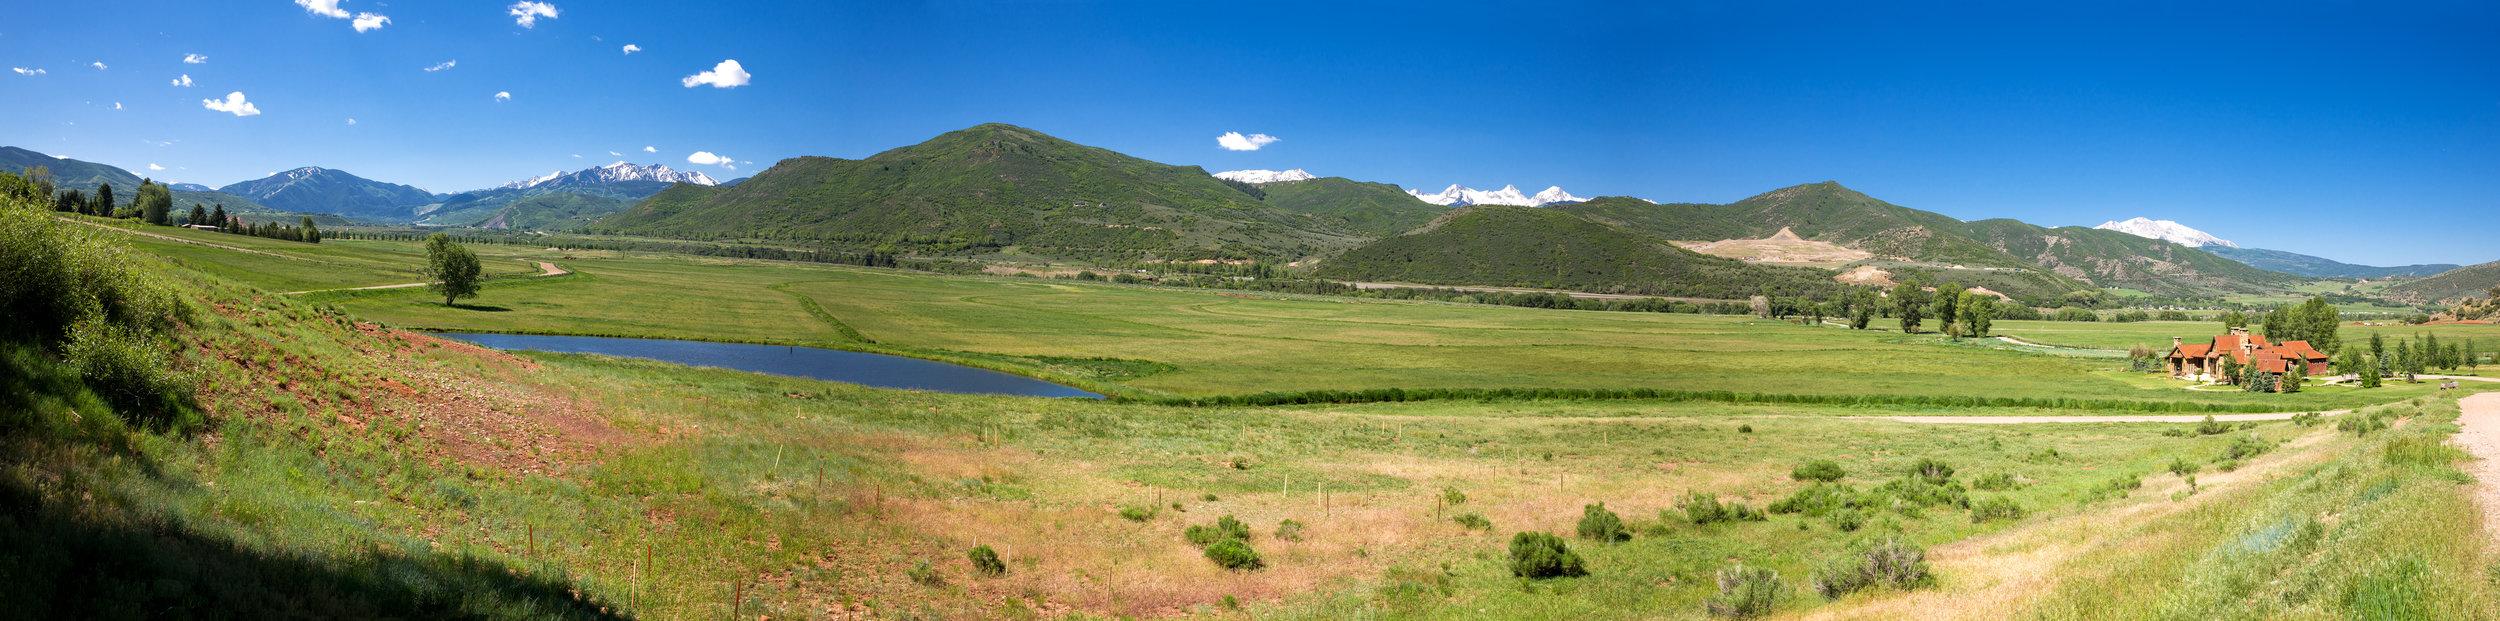 Aspen Valley Ranch Panorama2.jpg